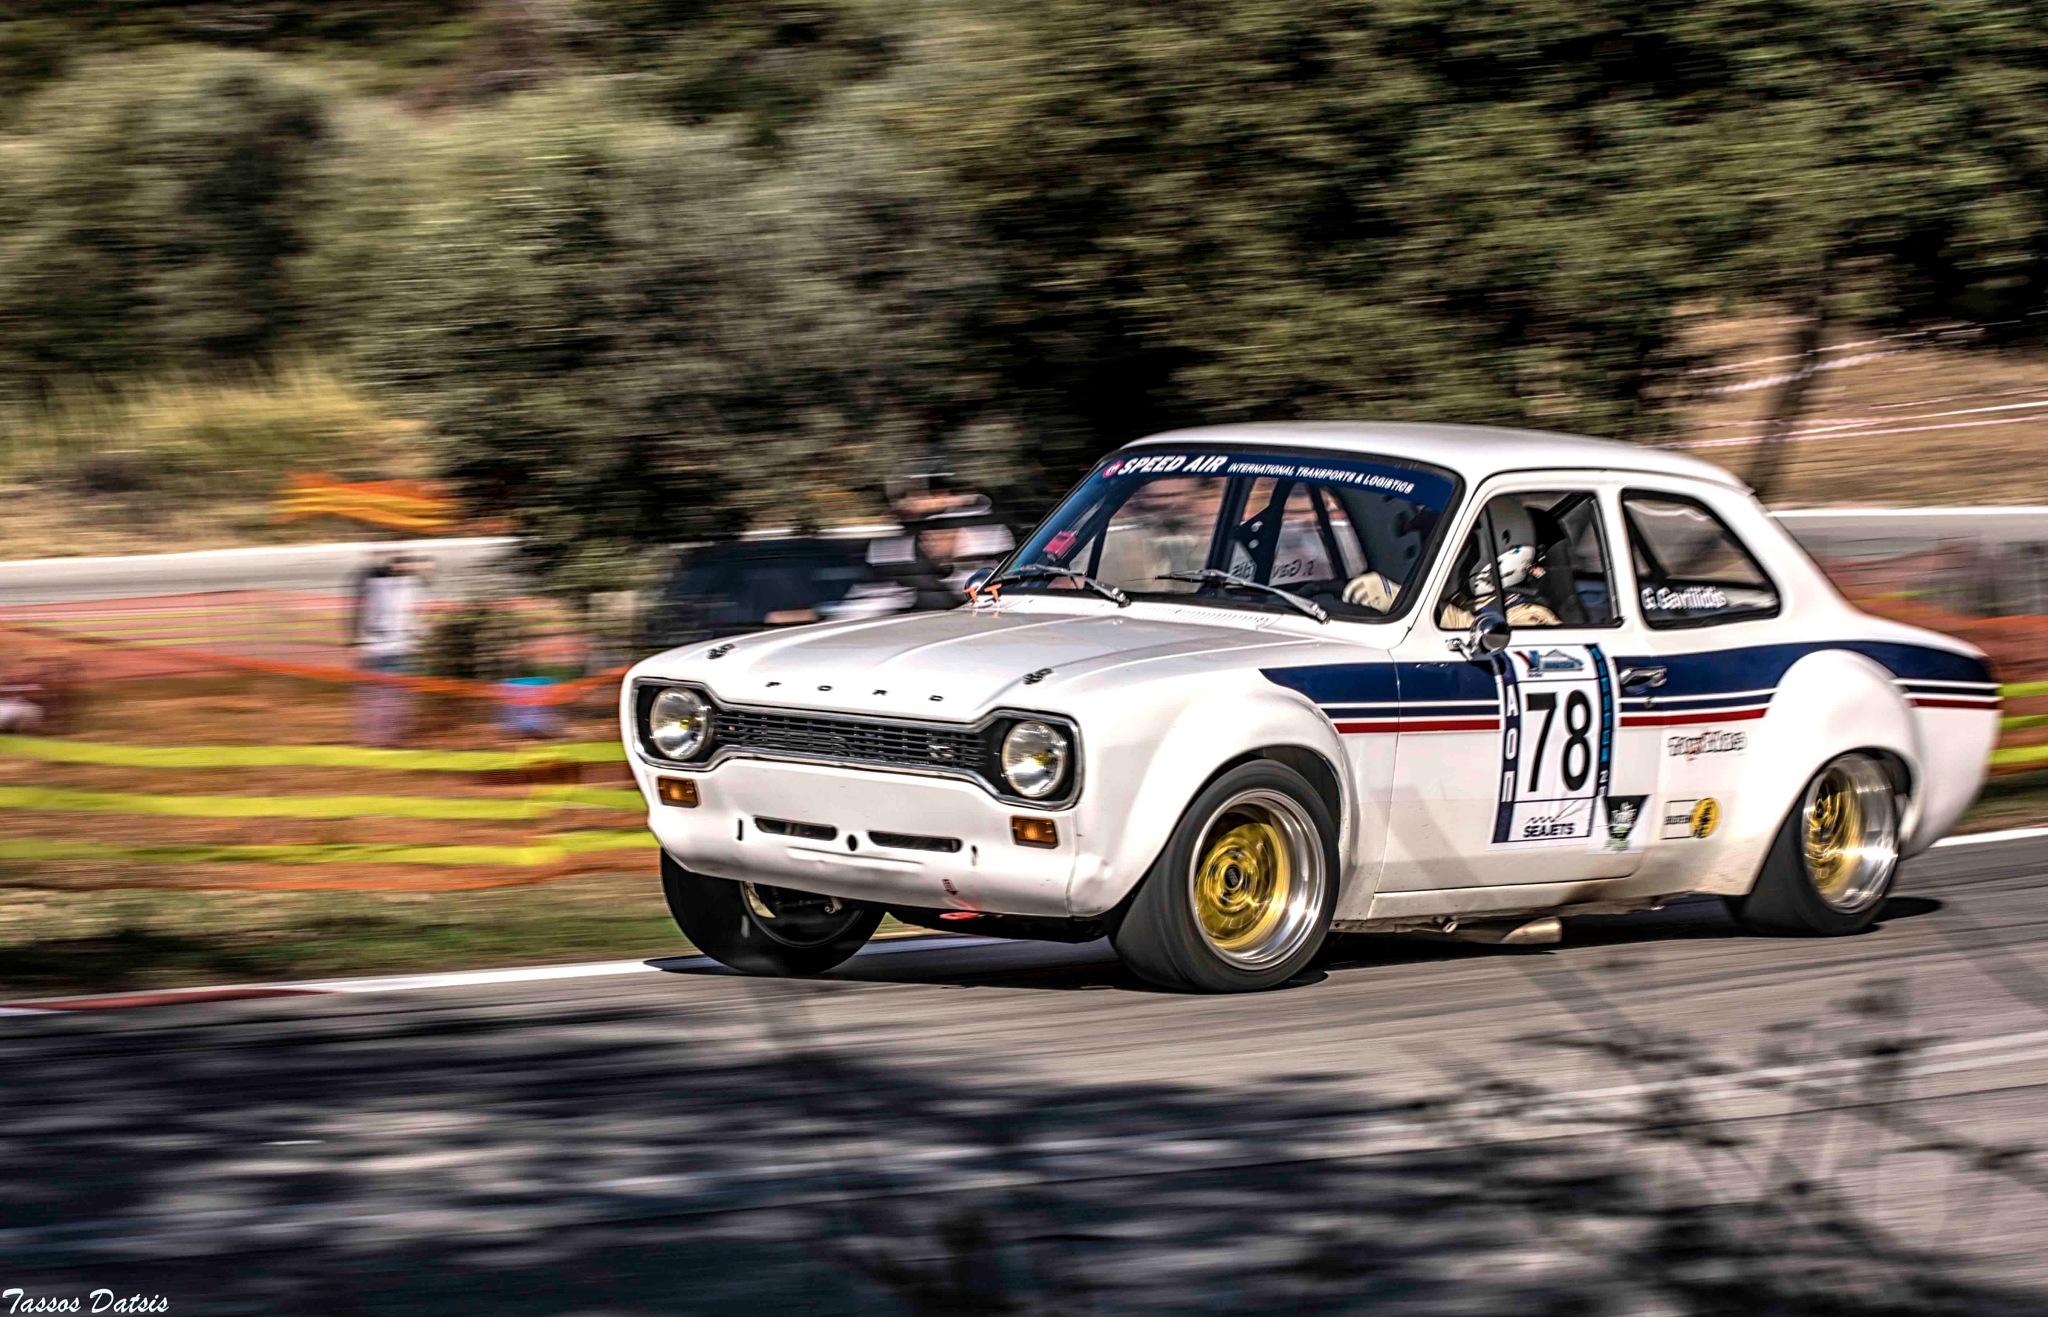 Rally 1 by Tassos Datsis